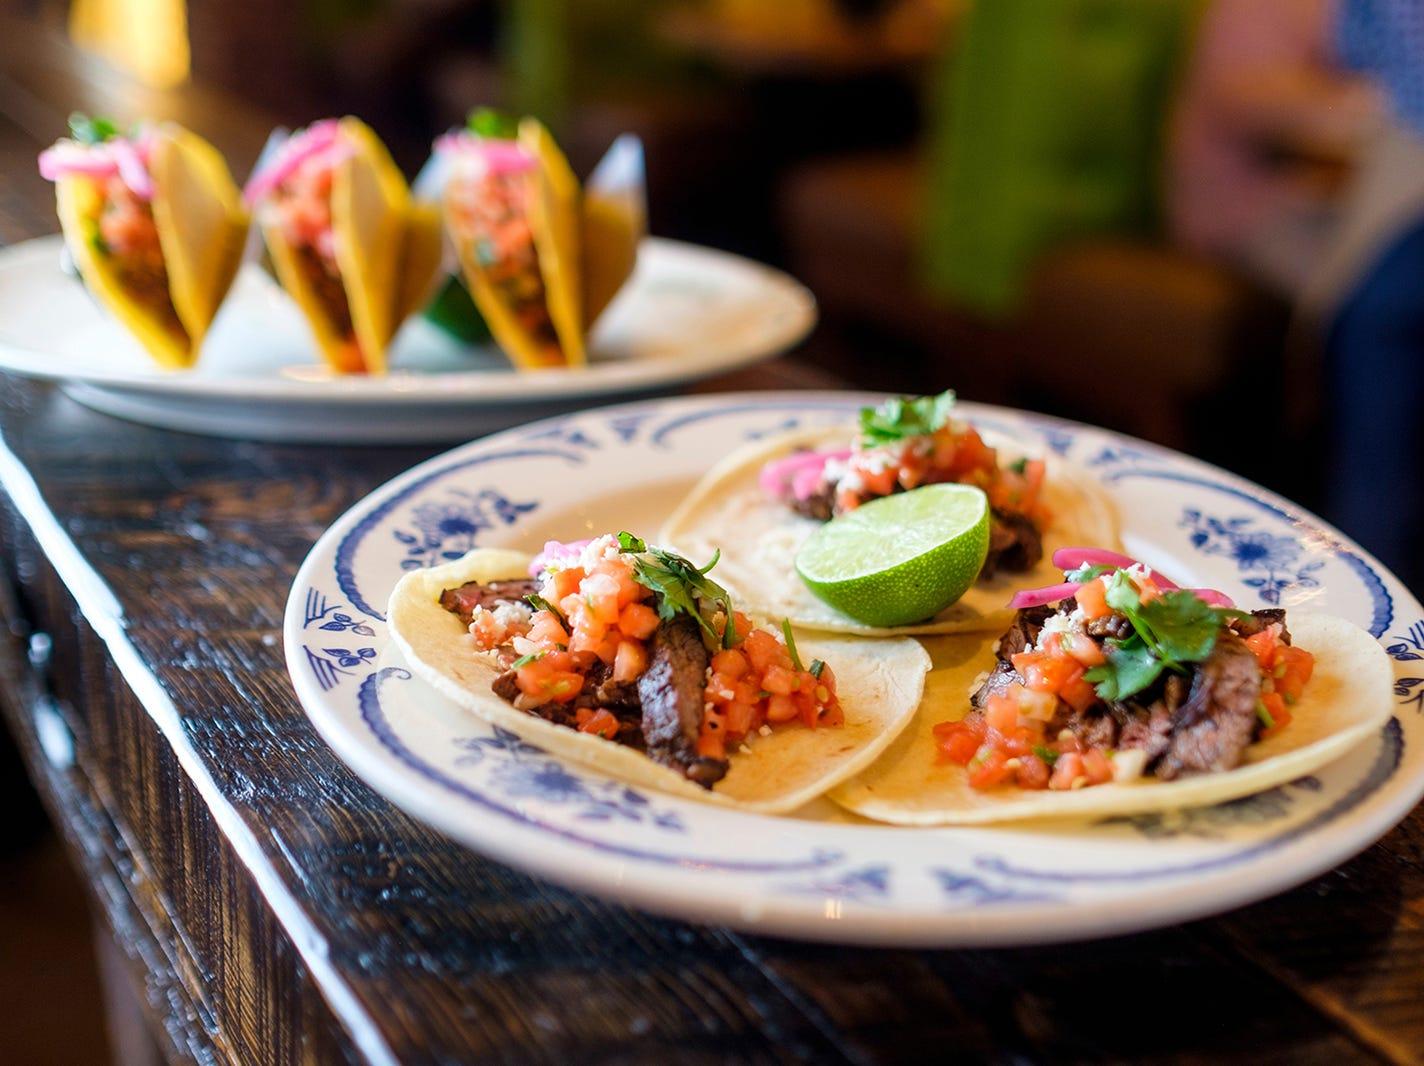 The Tradicional tacos at Rocco's Tacos & Tequila Bar feature carnitas-style pork, cilantro, onion and salsa brava.